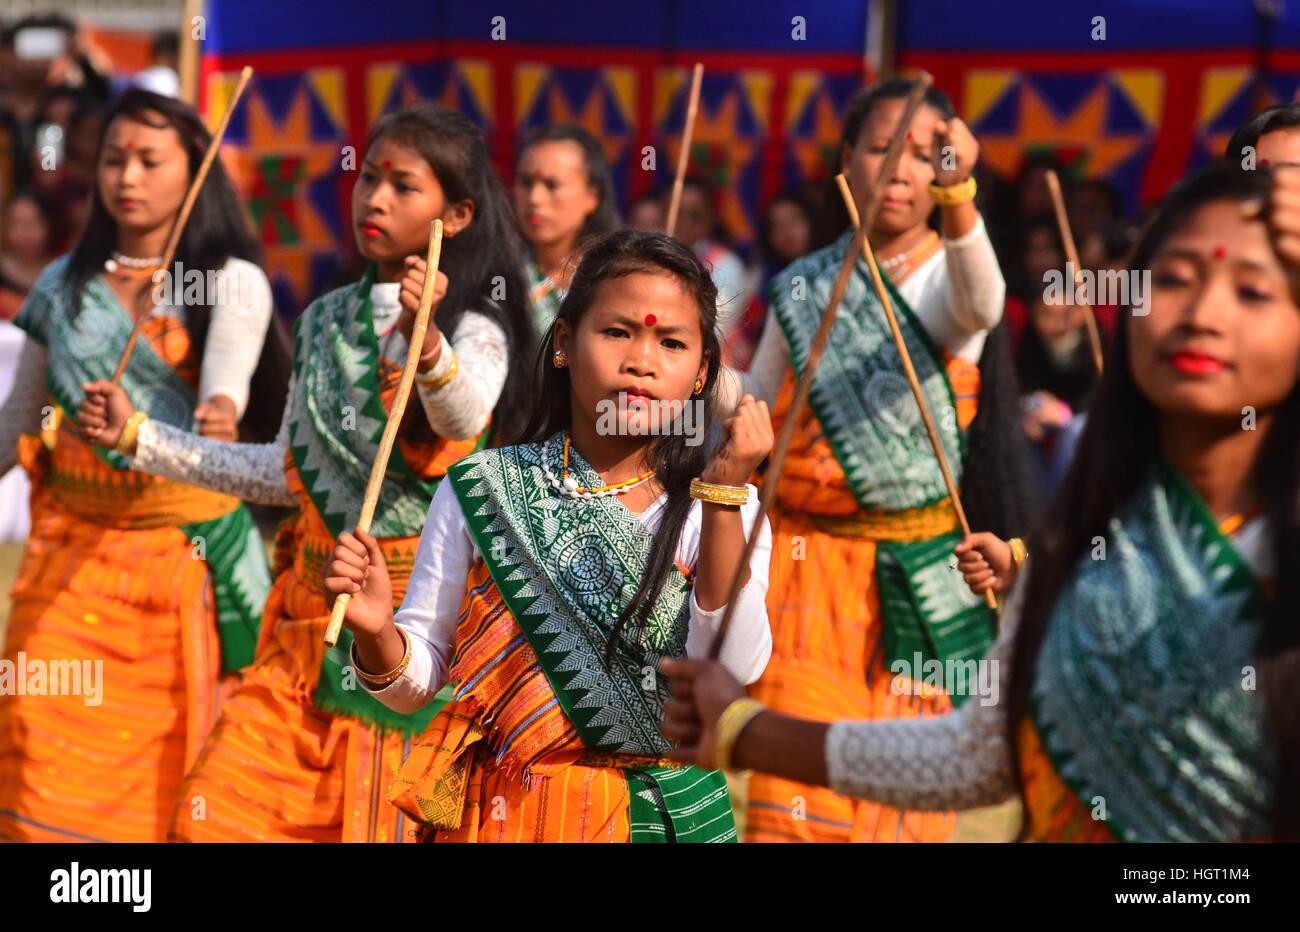 Dimapur, India, 13th January 2017. Indian tribal Kachari performs a cultural dance during the Aai Sagi festival, - Stock Image